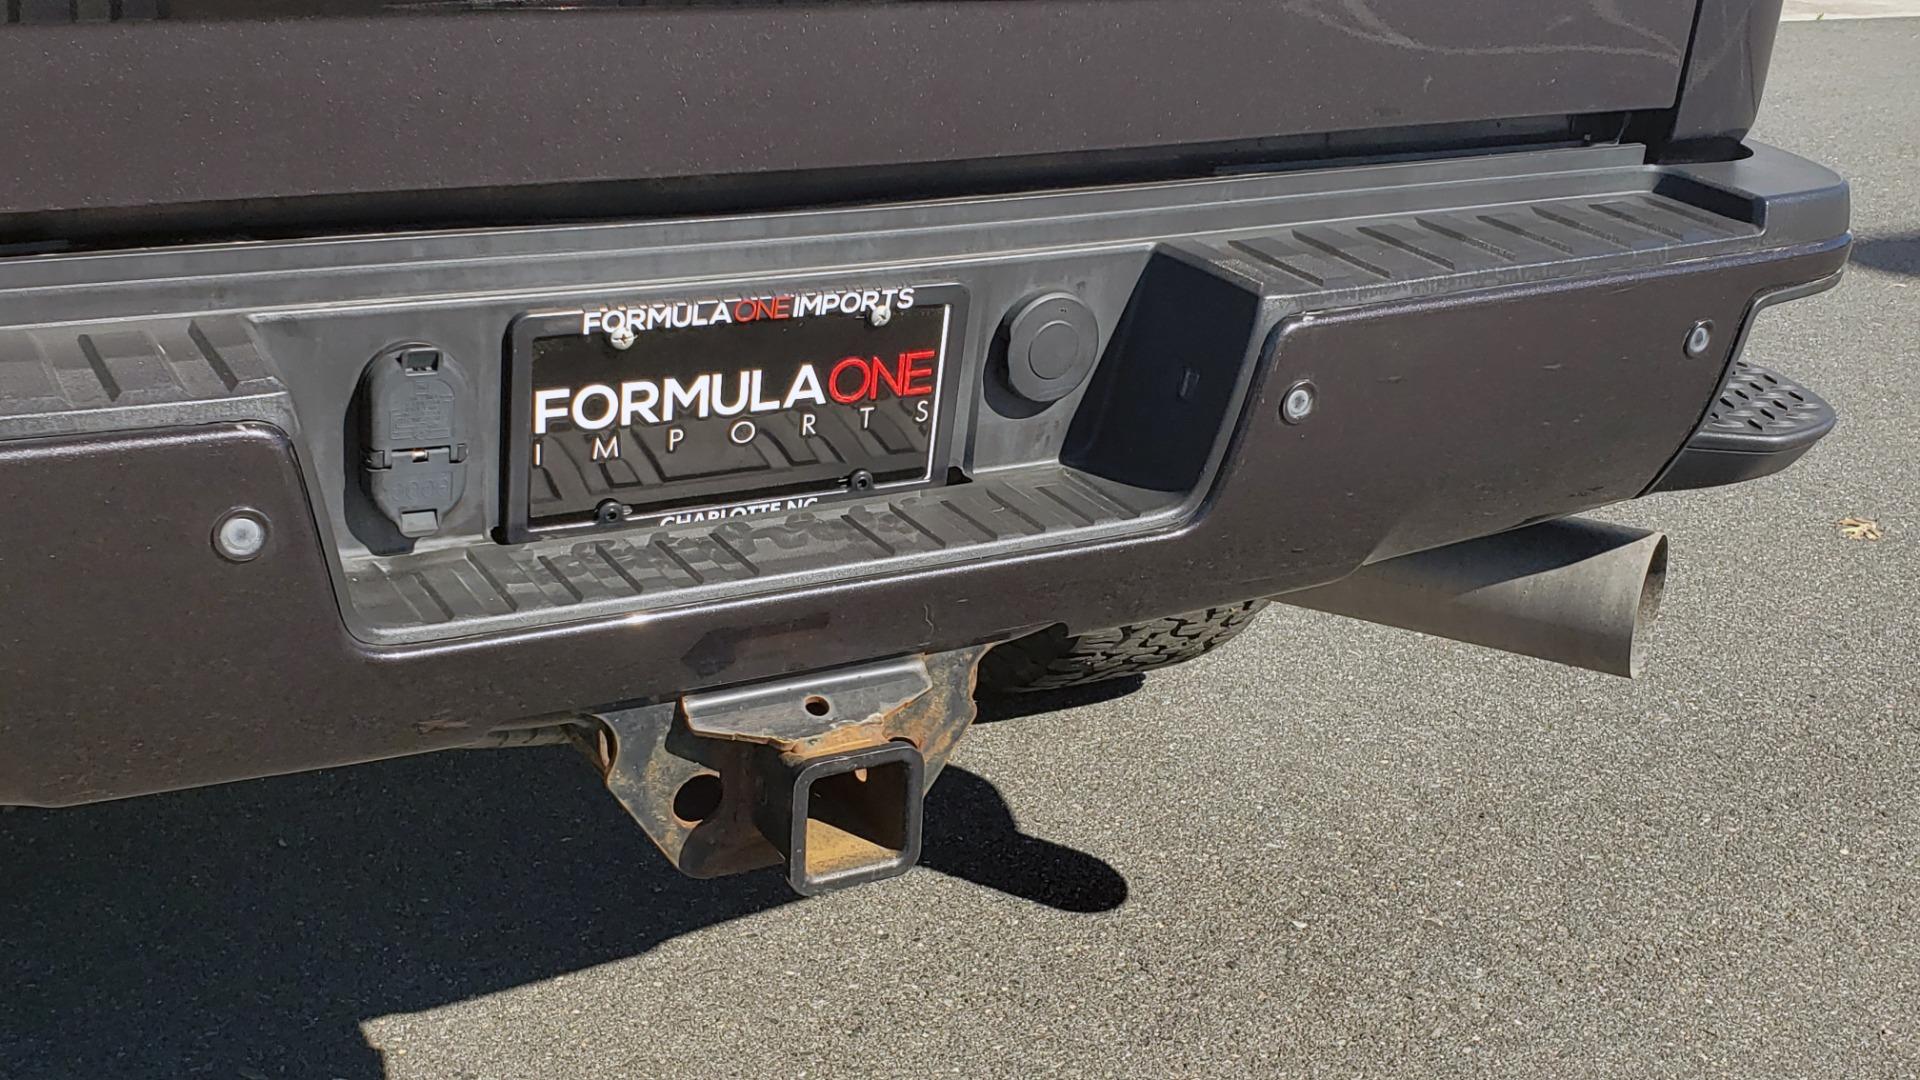 Used 2015 GMC SIERRA 2500HD DENALI 4WD CREWCAB / 6.6L DURAMAX / 6-SPD AUTO / NAV / BOSE for sale $50,995 at Formula Imports in Charlotte NC 28227 34